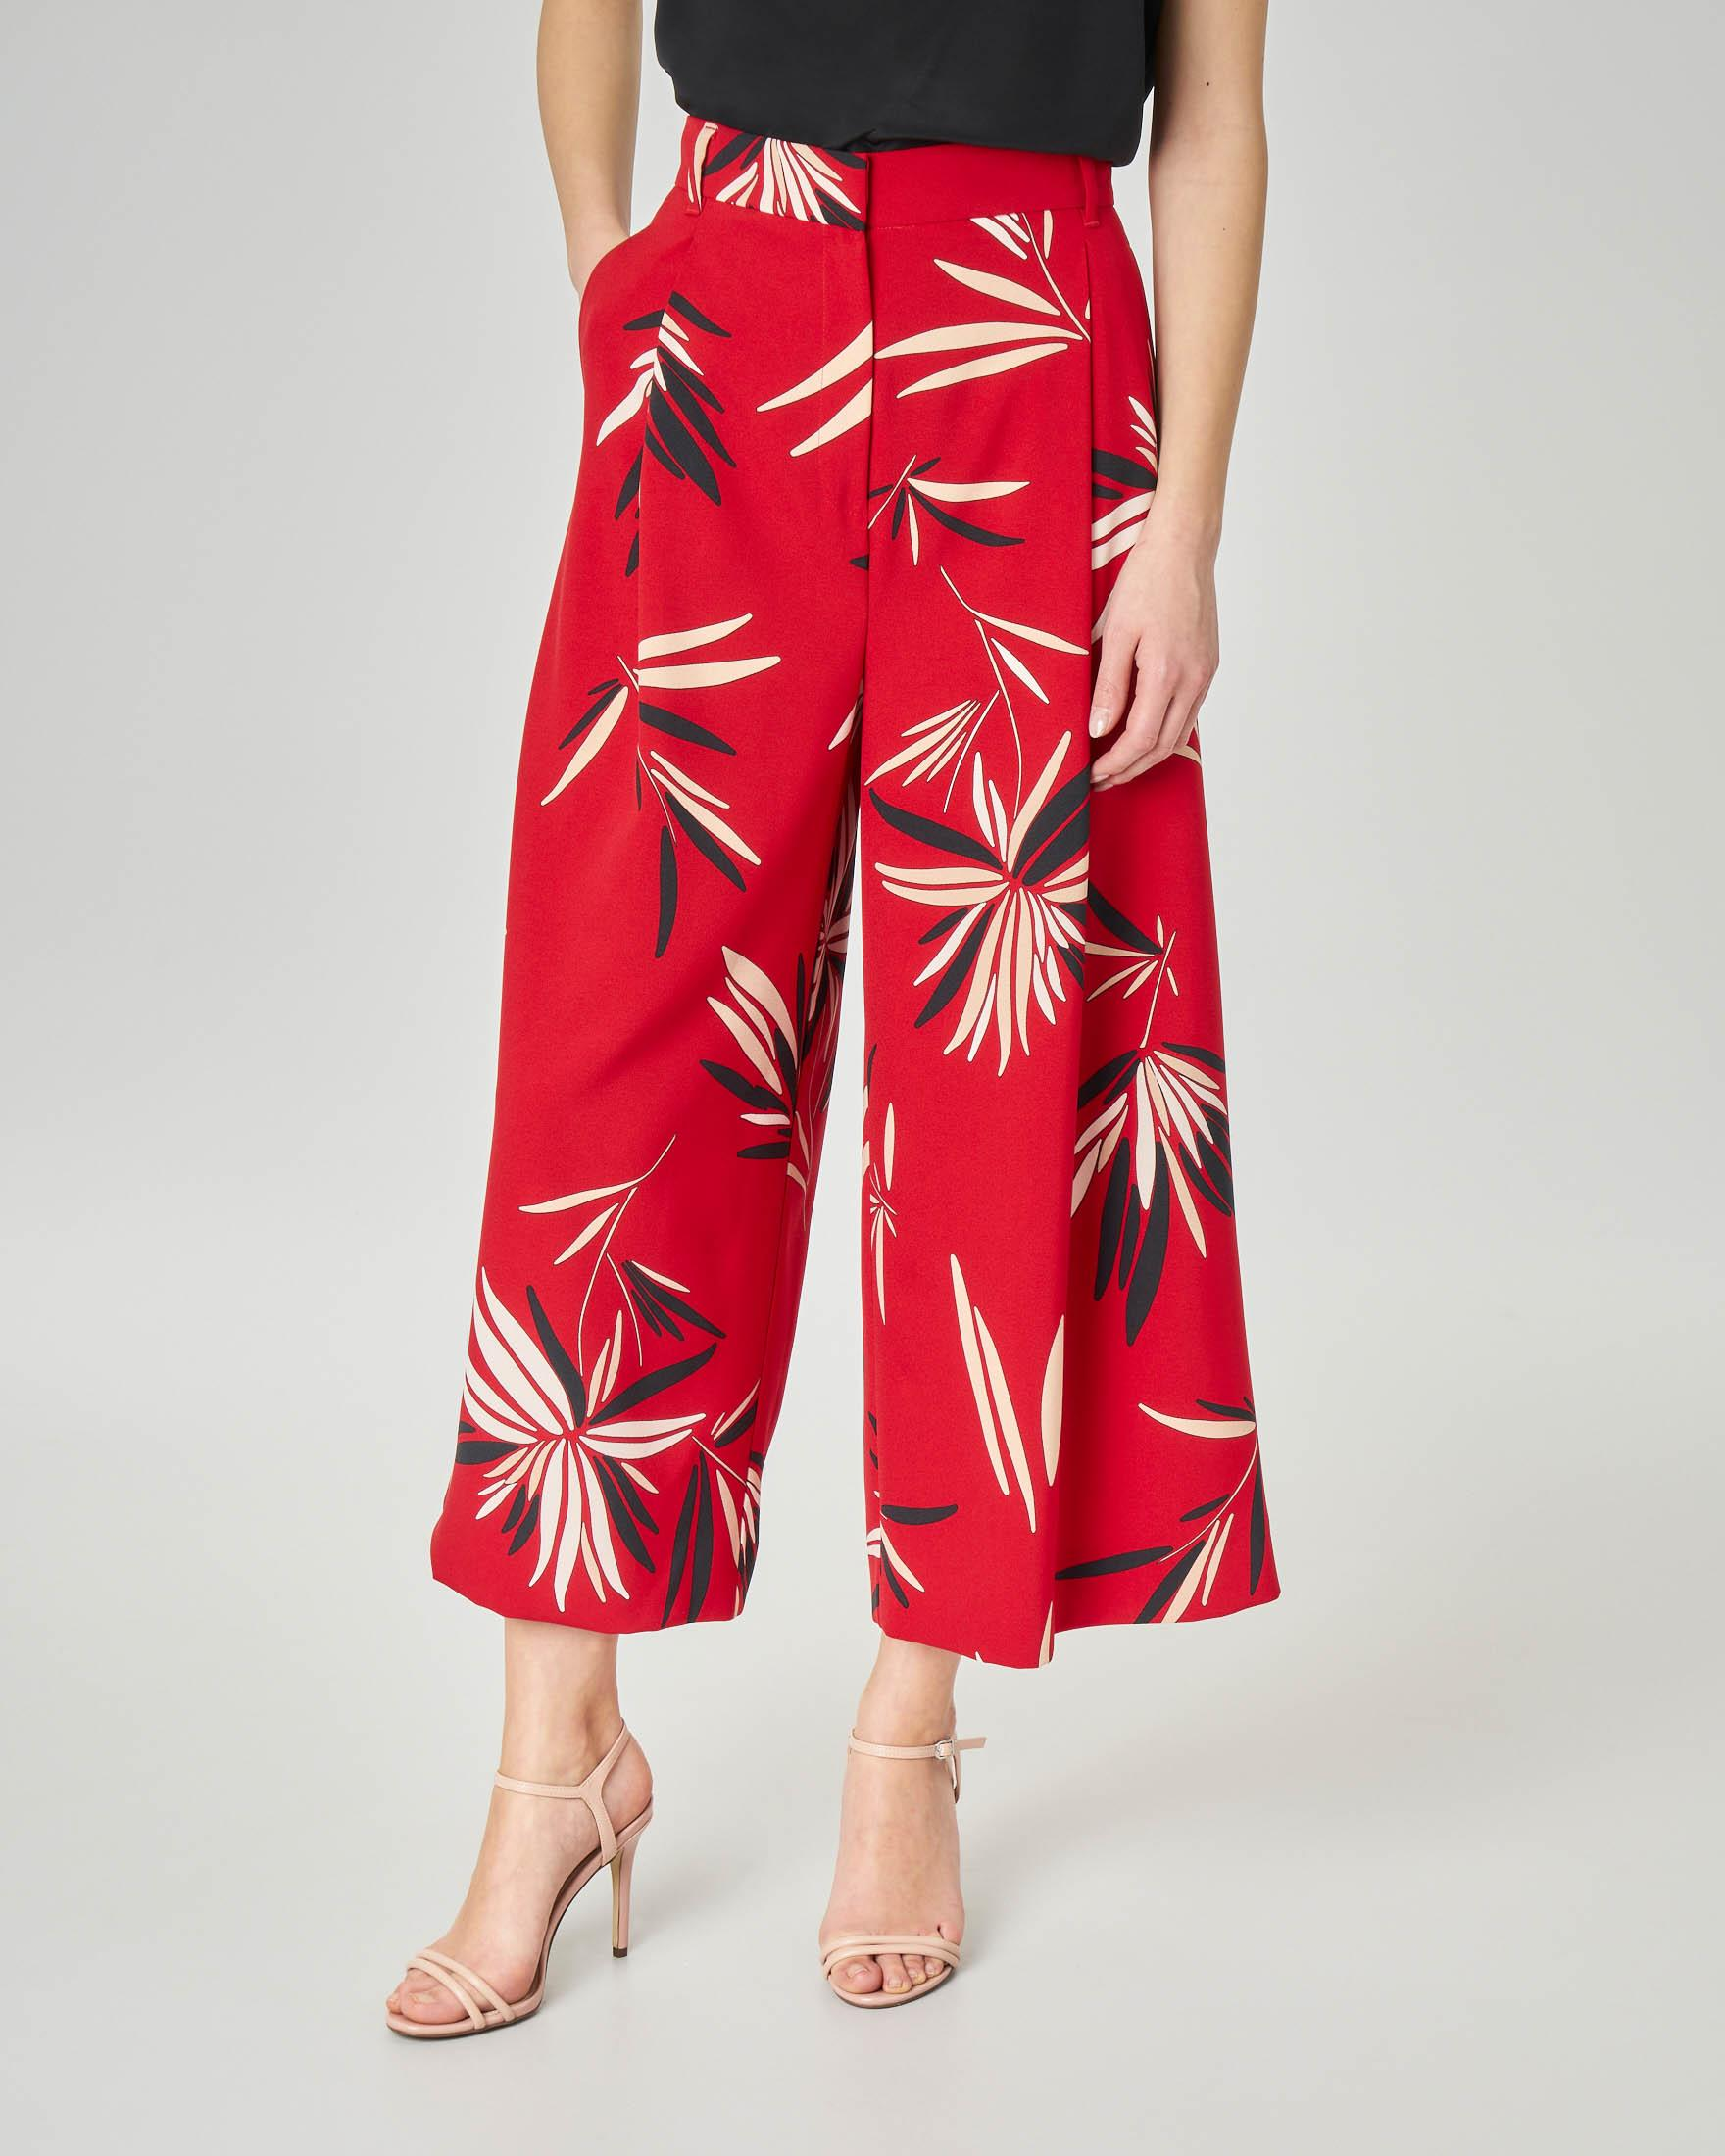 Pantaloni culotte rossi a stampa foliage